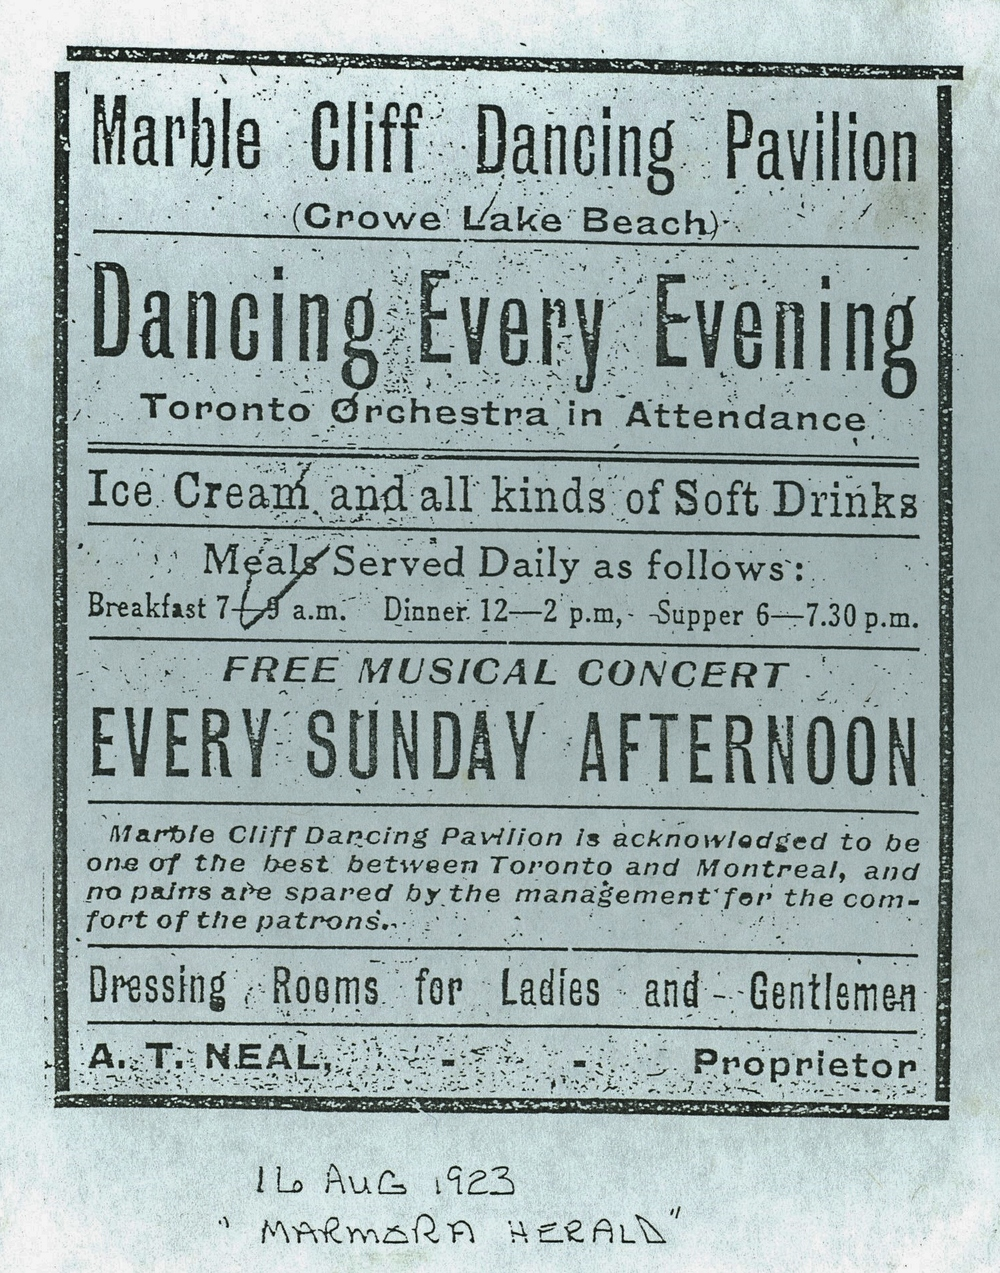 Marble Cliff Dancing Pavillion.jpg